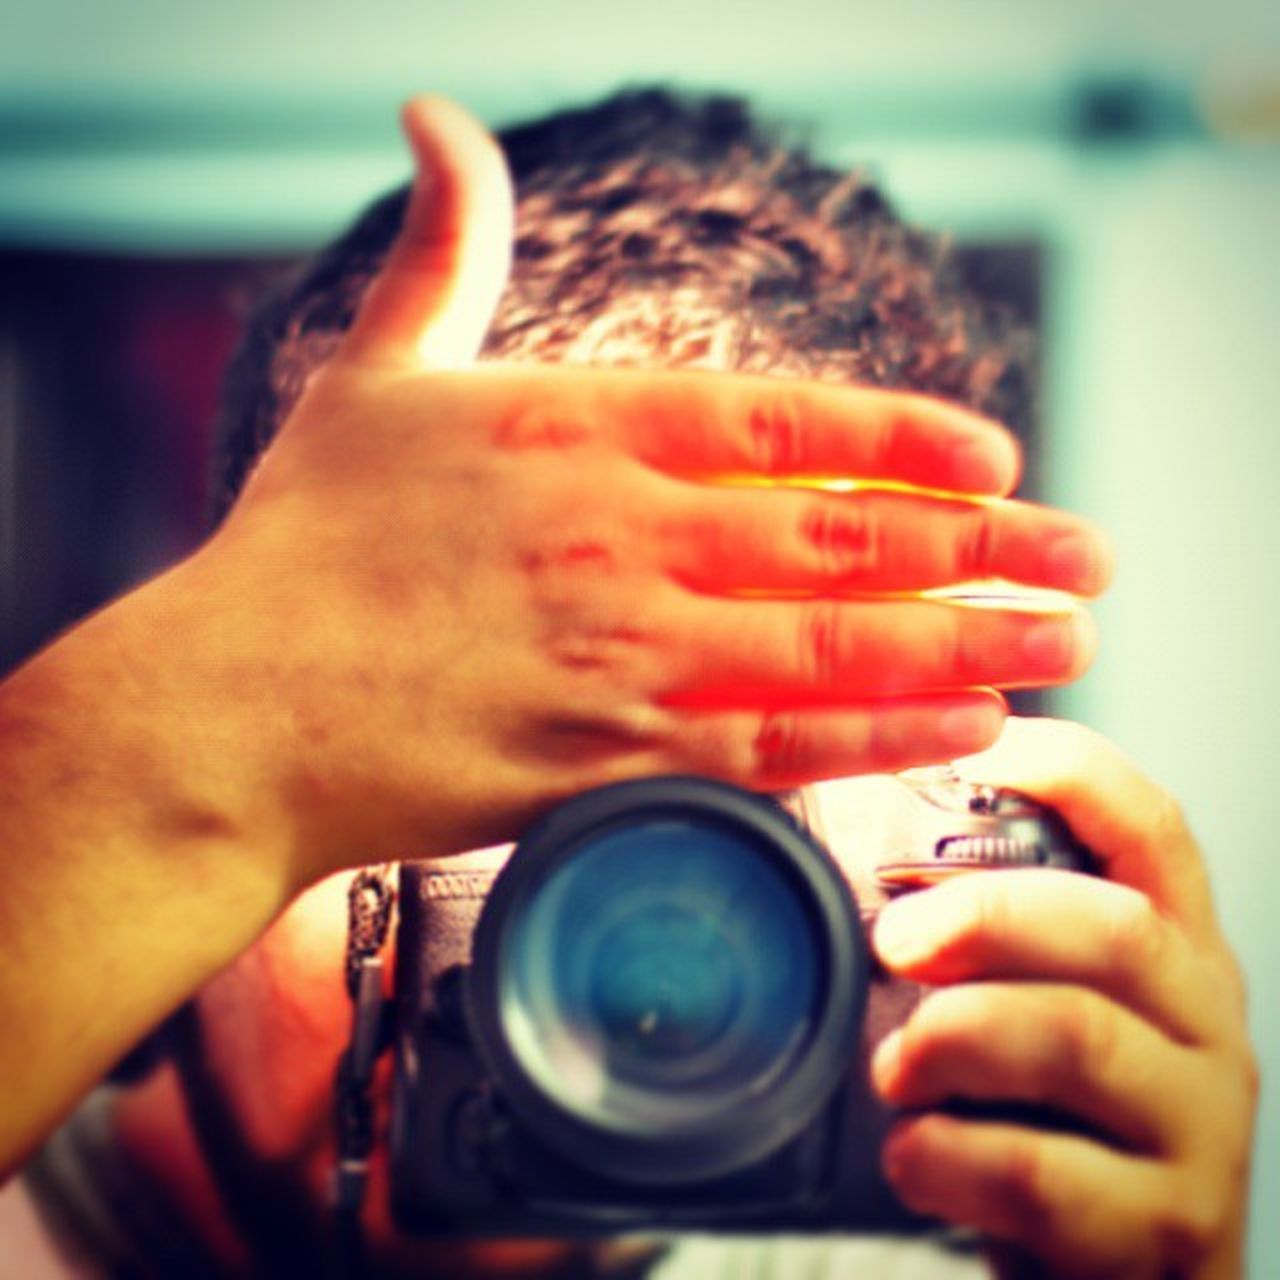 Burning Selfie Camera Nikon Love Revoshotsphotography Revo Revoshots IExplore IExploreKashmir IExploreMe